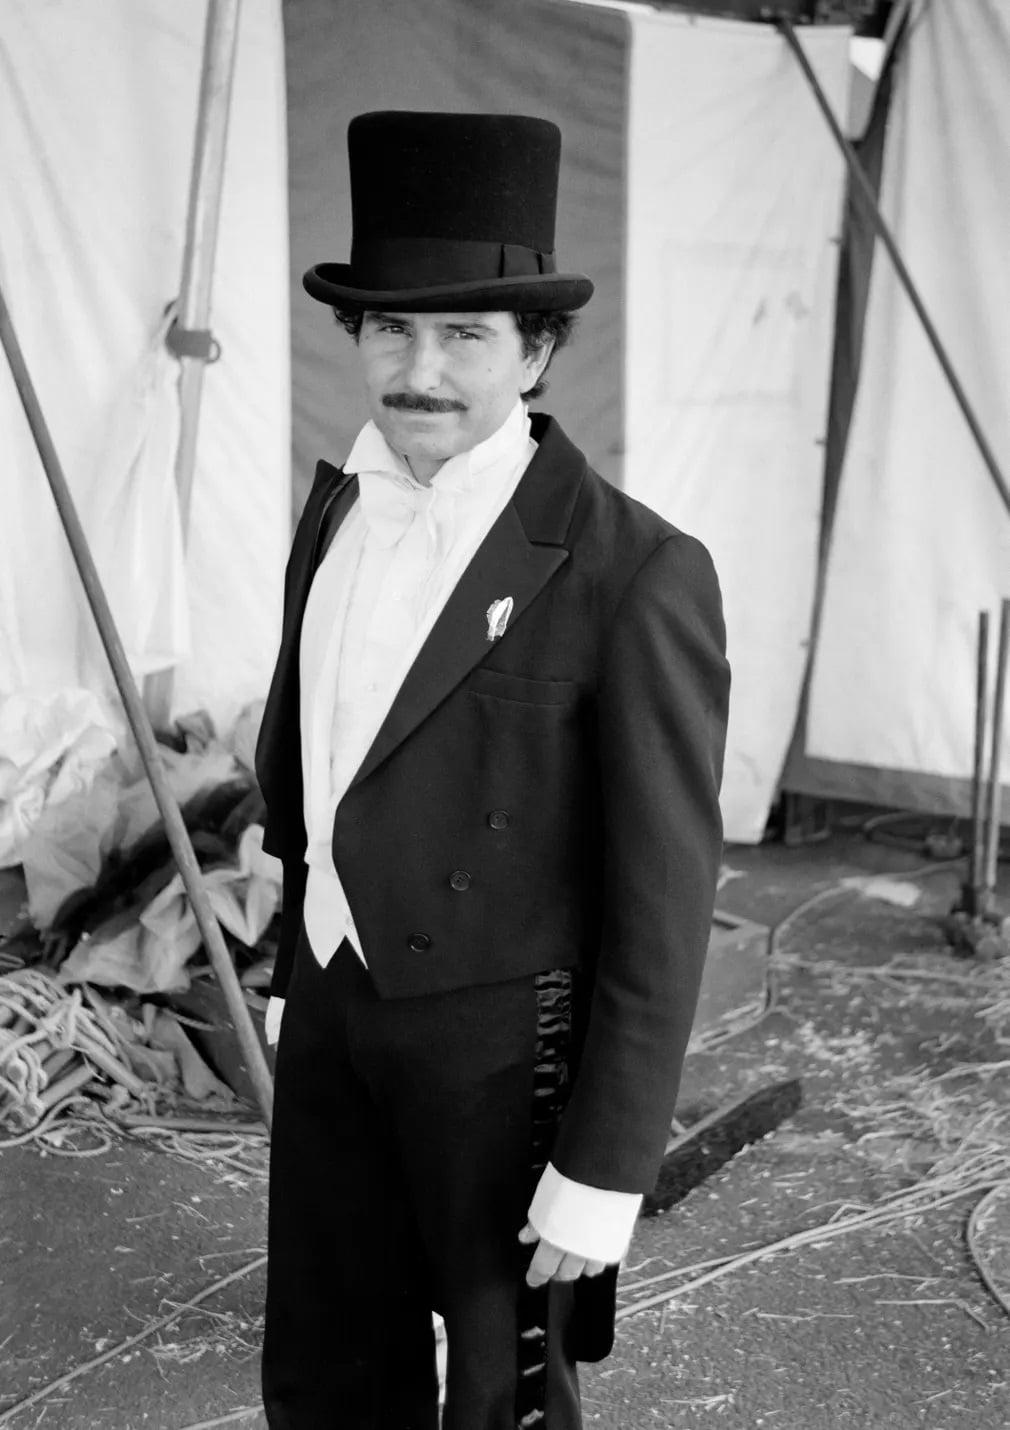 Tino Wallenda Porondmester Mutatvanyos Cirkusz Nap Fotoja